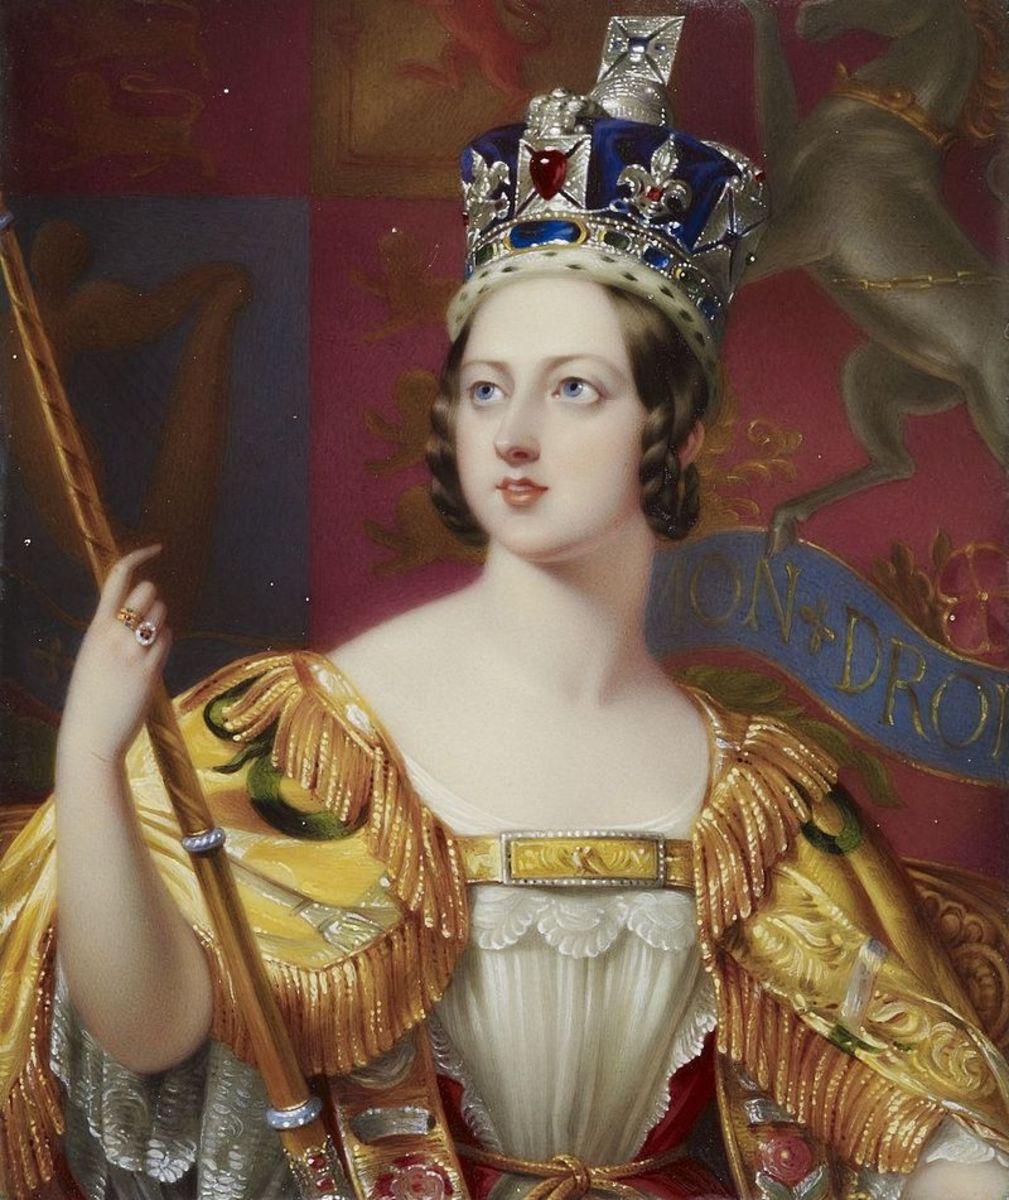 Queen Victoria's coronation portrait.